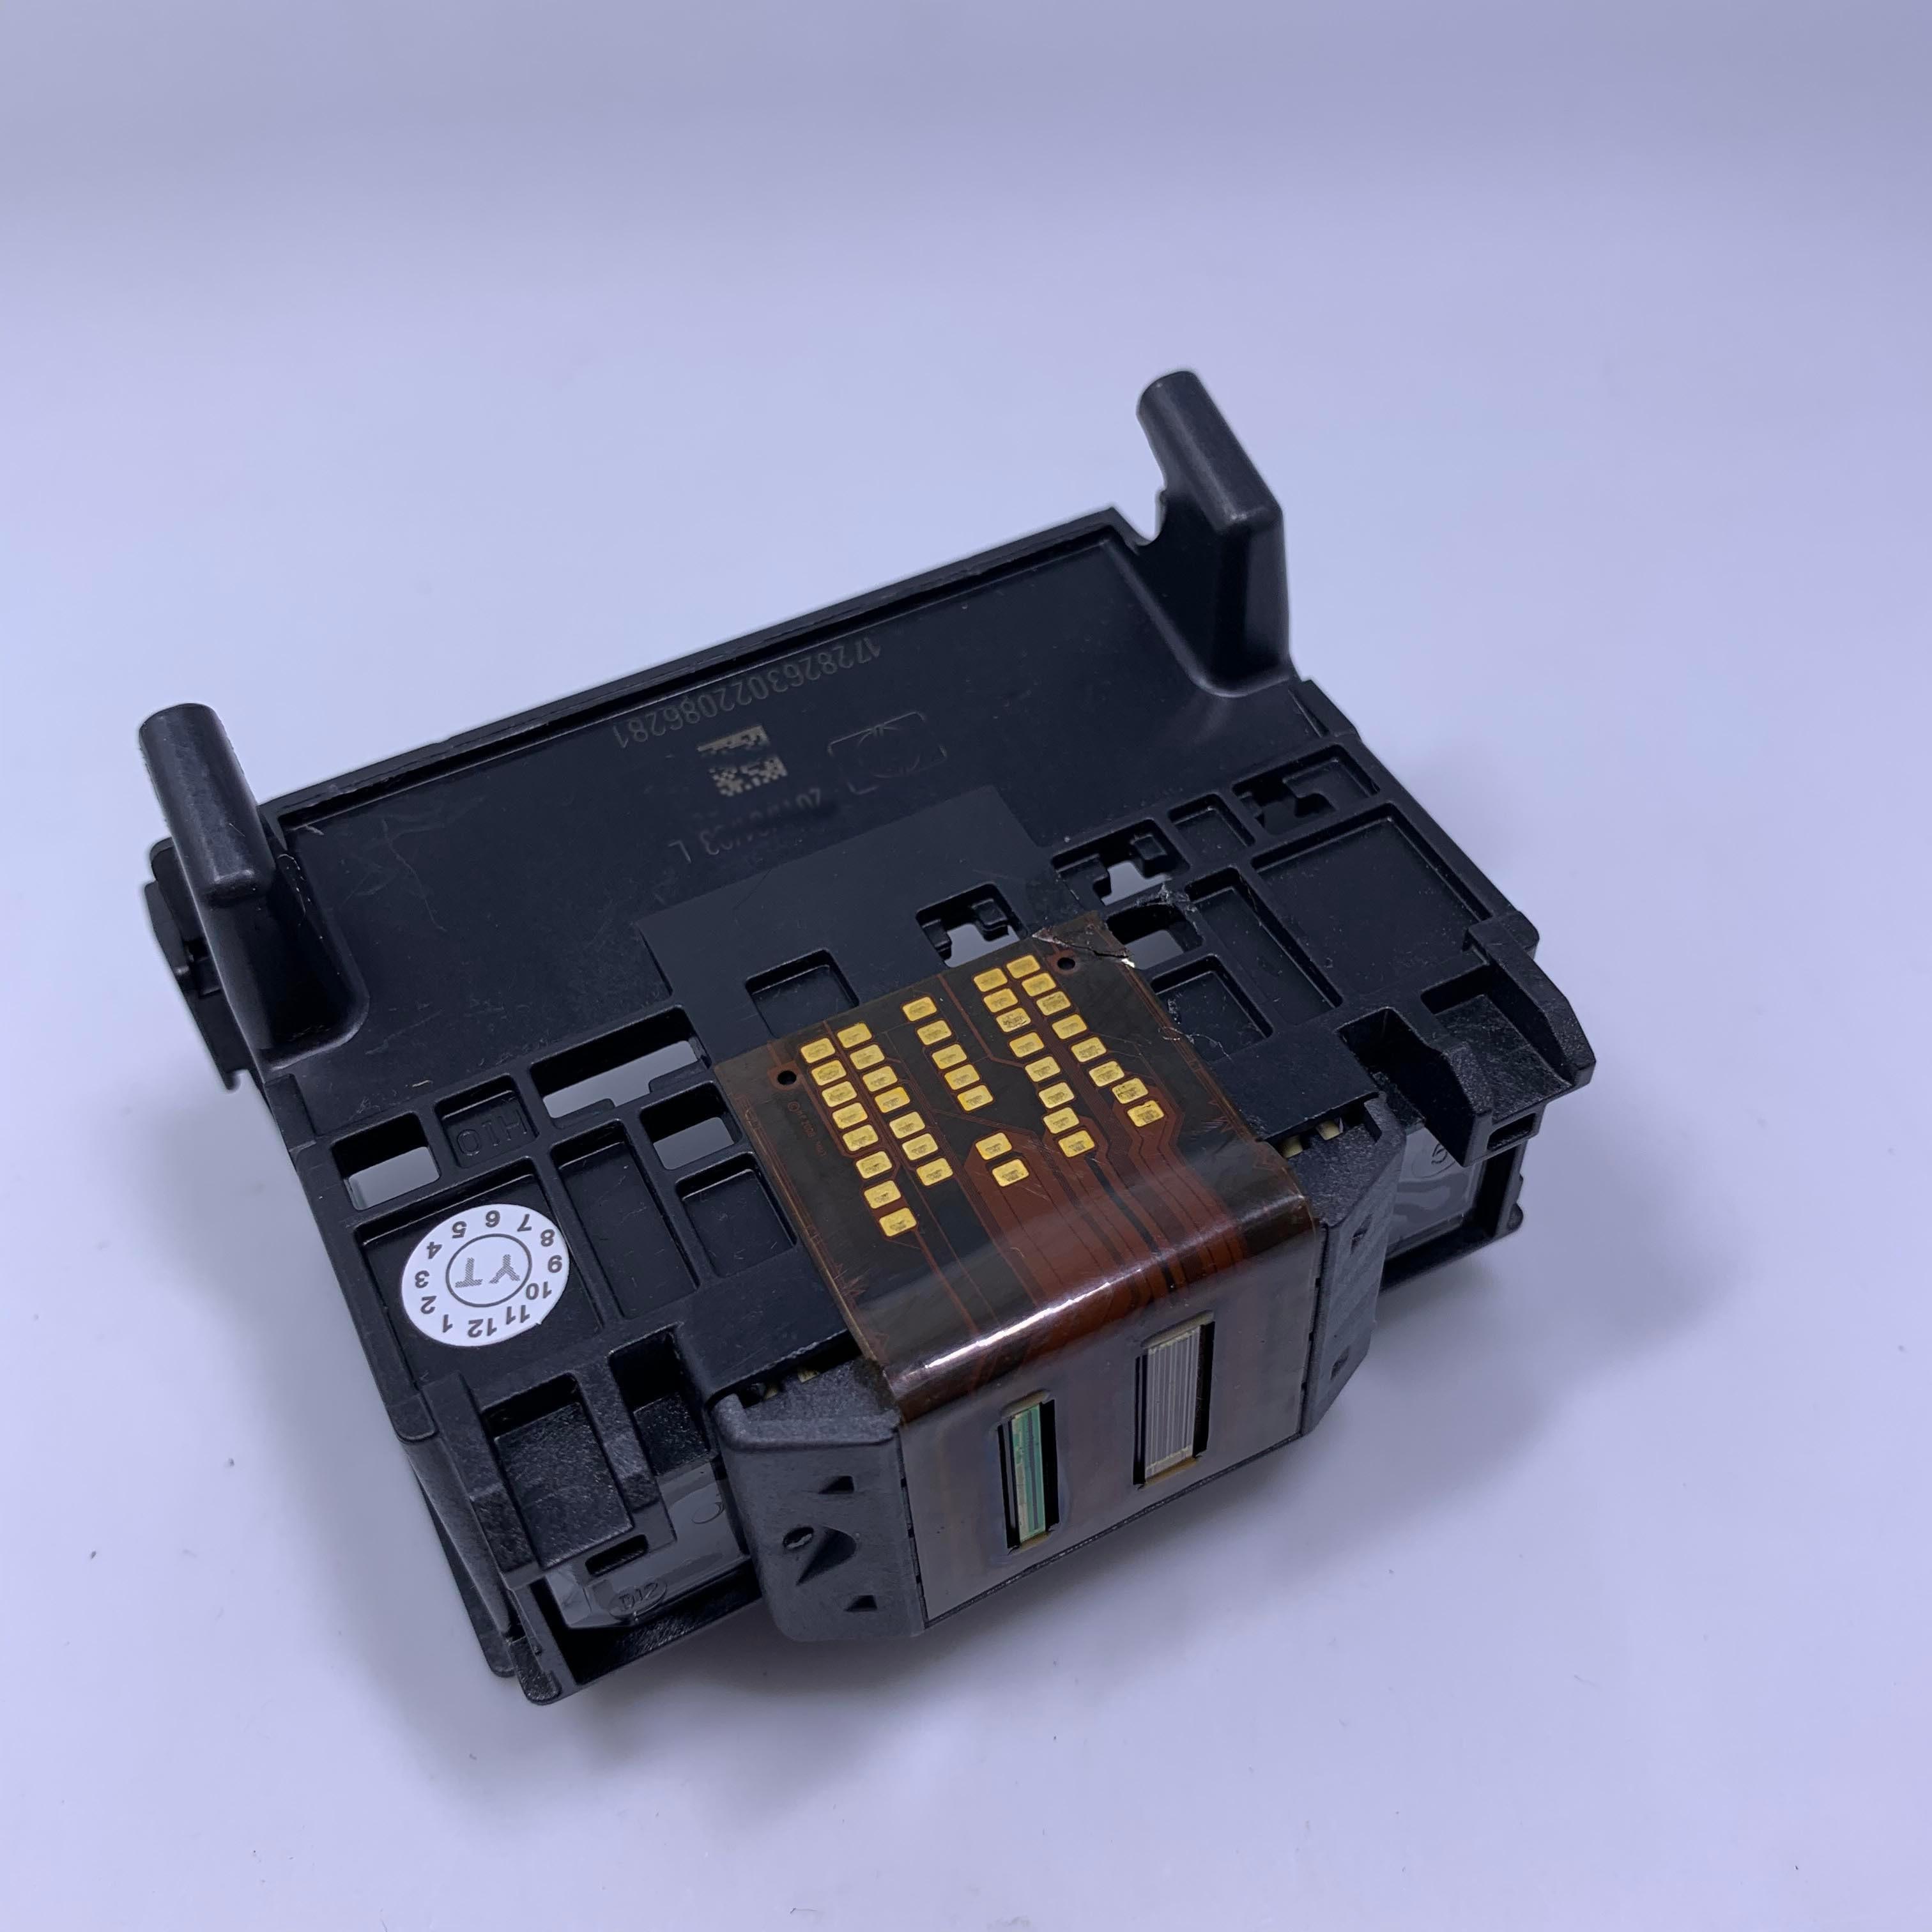 YOTAT 4 slot remanufactured 862 printhead For HP 862 print head For HP Photosmart C5324/D5460/D5463/D5468/C6375 printer